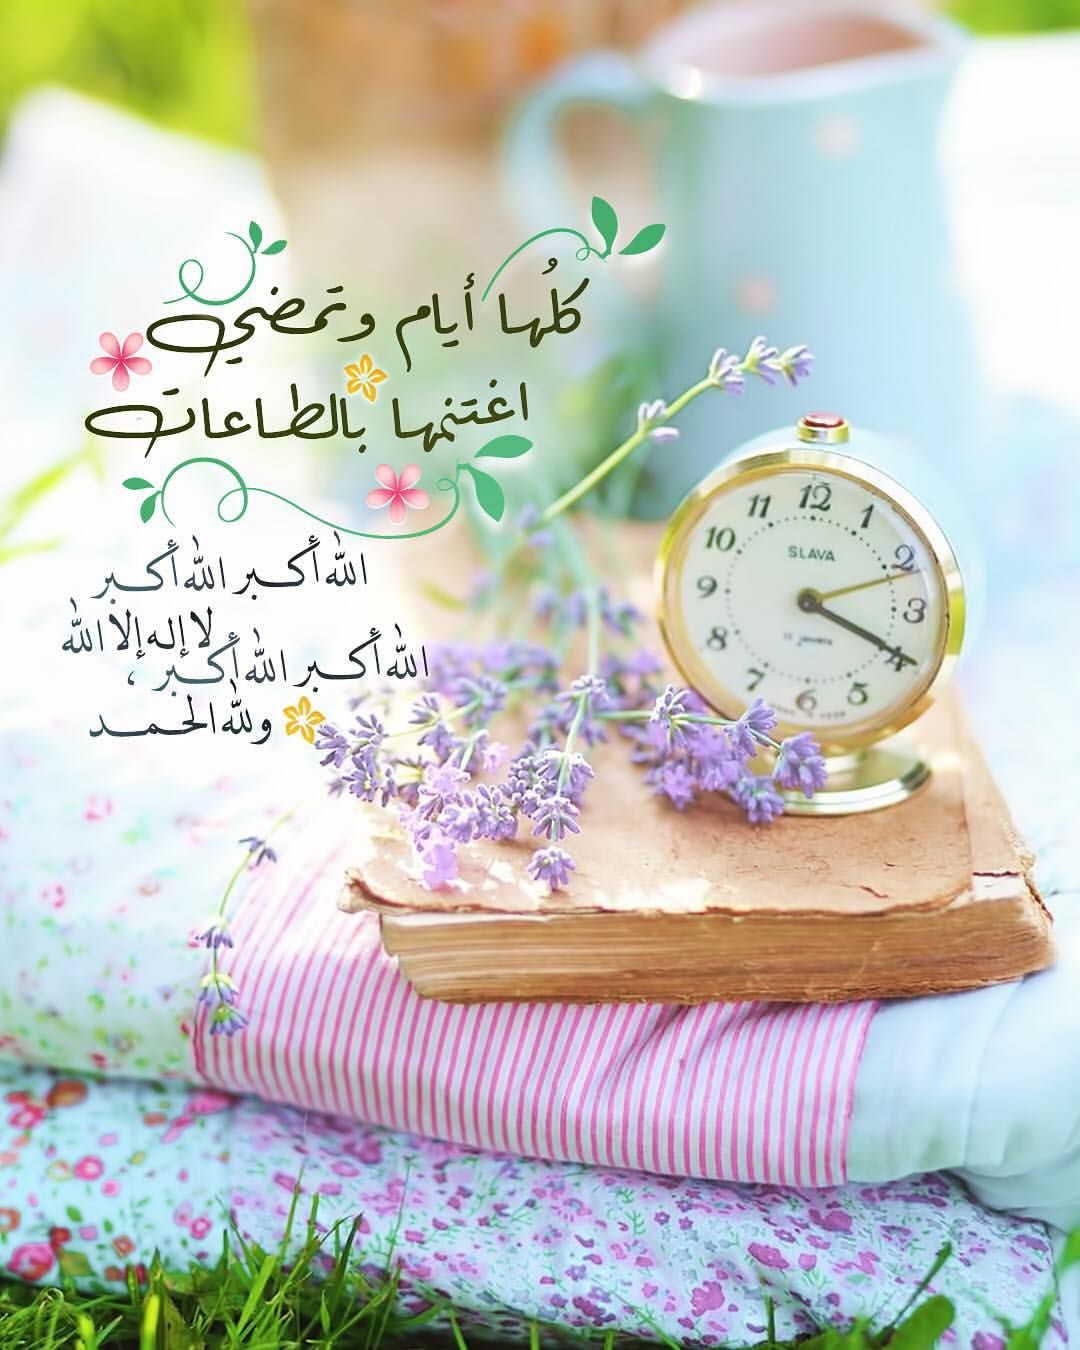 Pearla0203 On Instagram كلها أيام وت مضي اغت نمها بالط اعات ㅤㅤㅤㅤㅤㅤㅤㅤ الله أكبر الله أكبر ال Good Morning Greetings Good Morning Arabic Inside Art